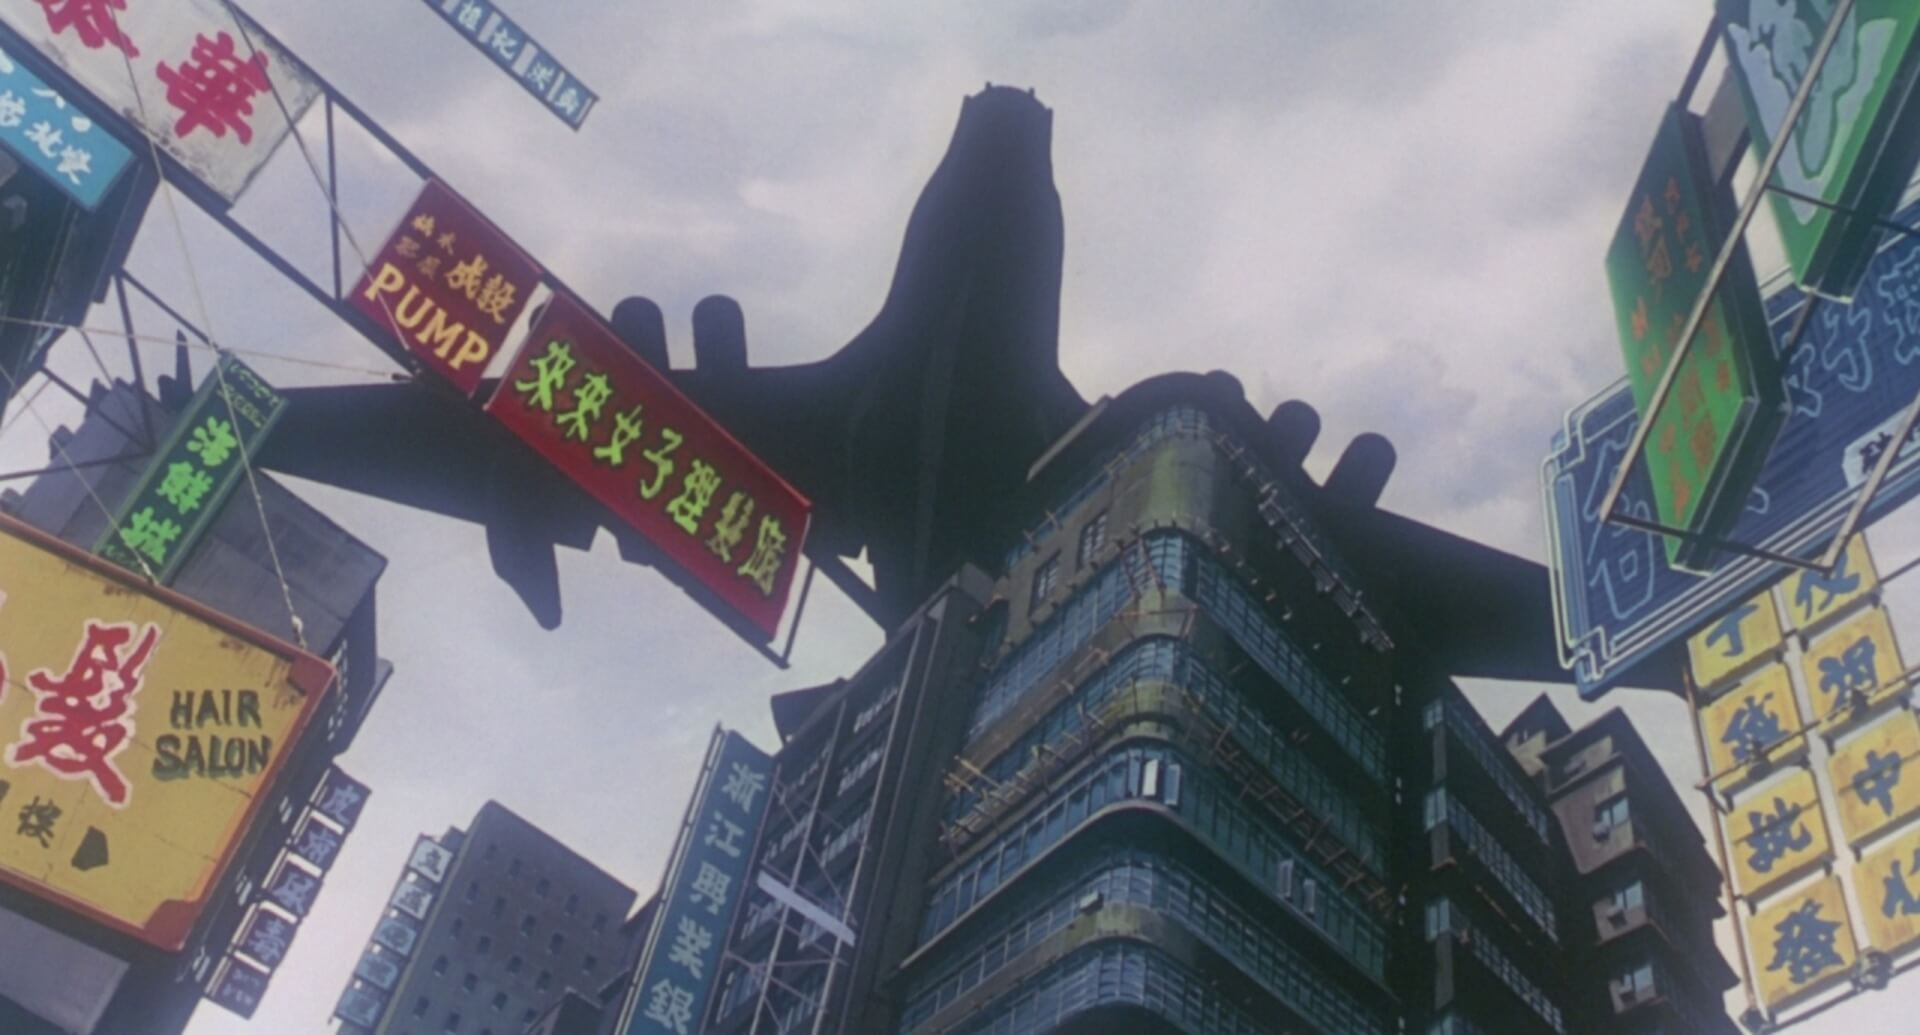 『GHOST IN THE SHELL/攻殻機動隊 4Kリマスター版』がIMAX&通常上映決定!押井守からのコメントも film210820_ghostintheshell_imax_2